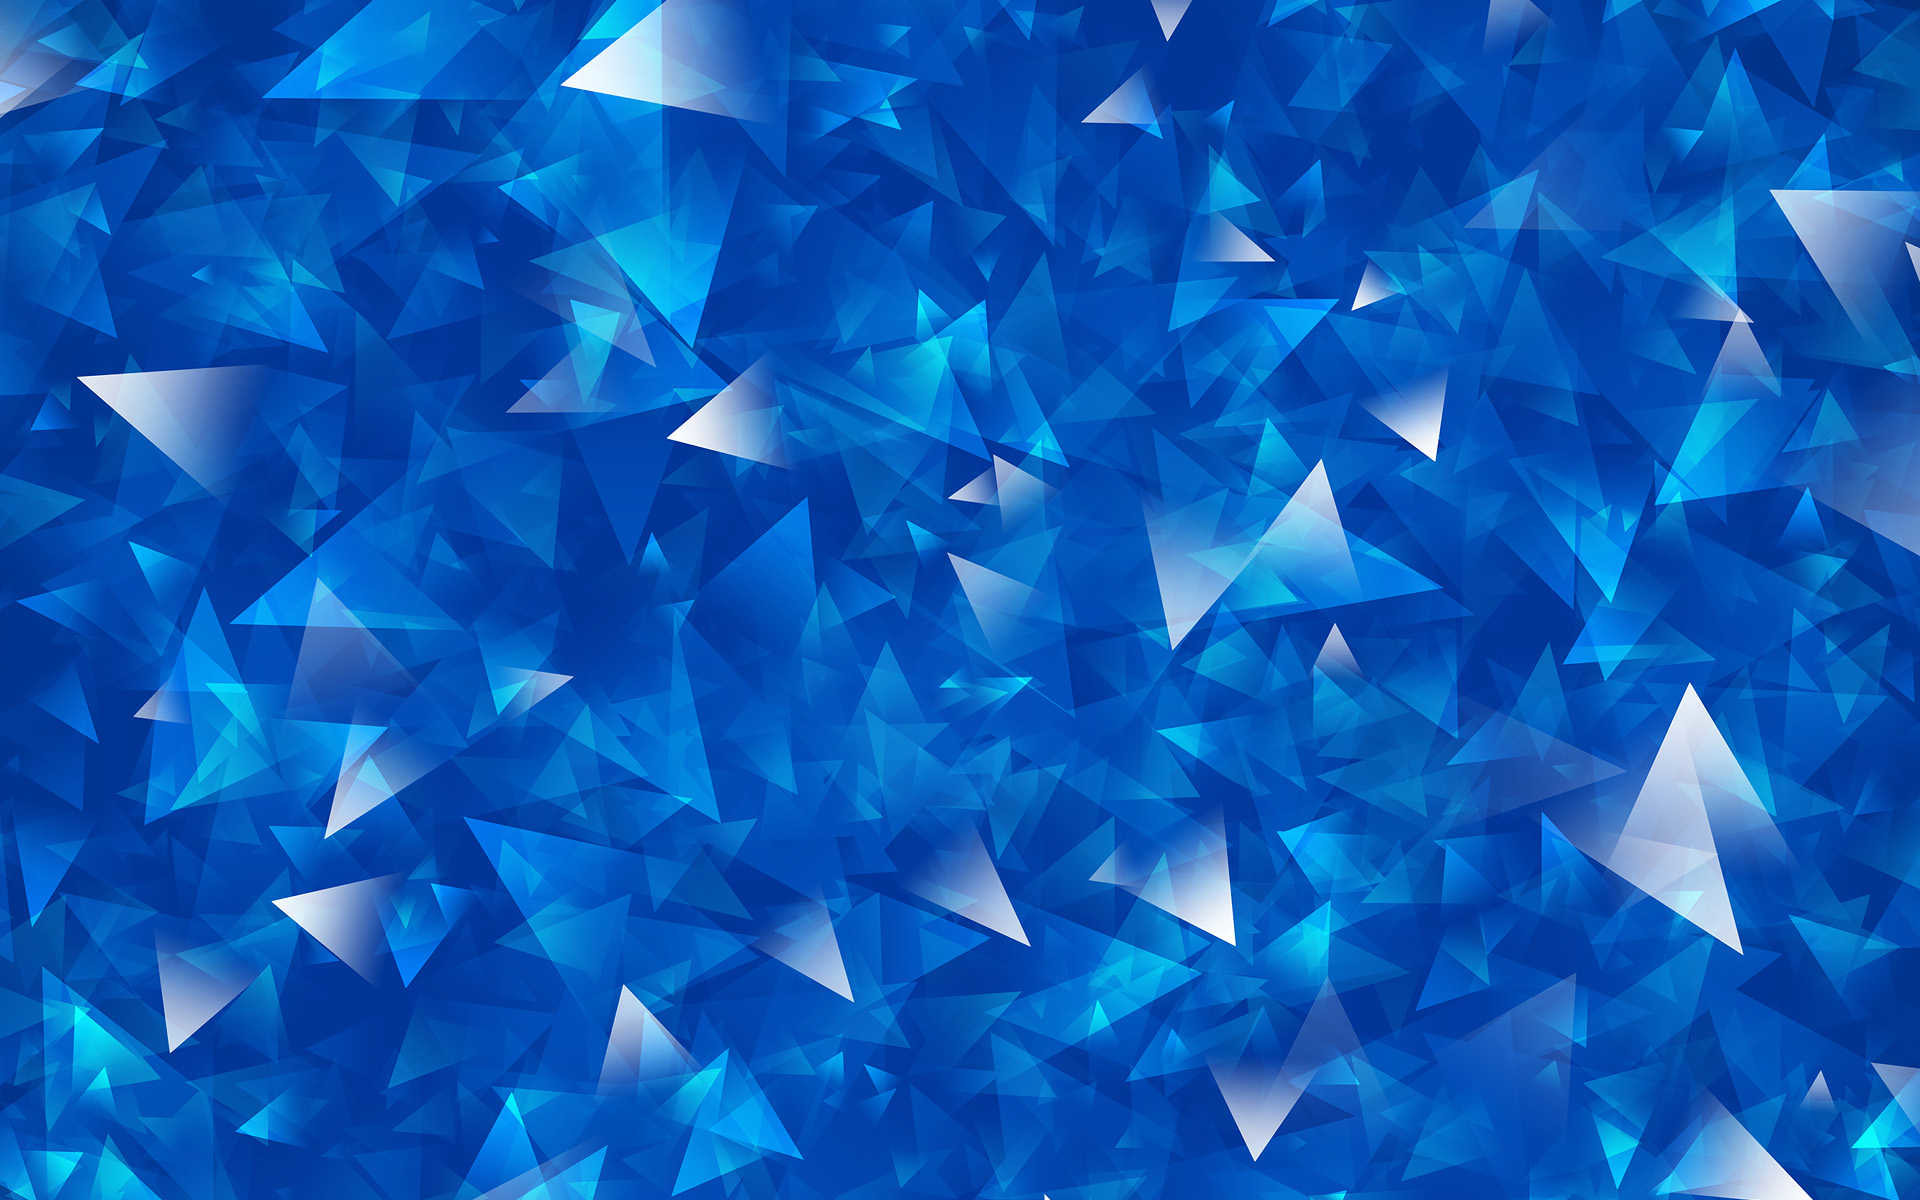 Blue Crystal Wallpaper (51+ images)